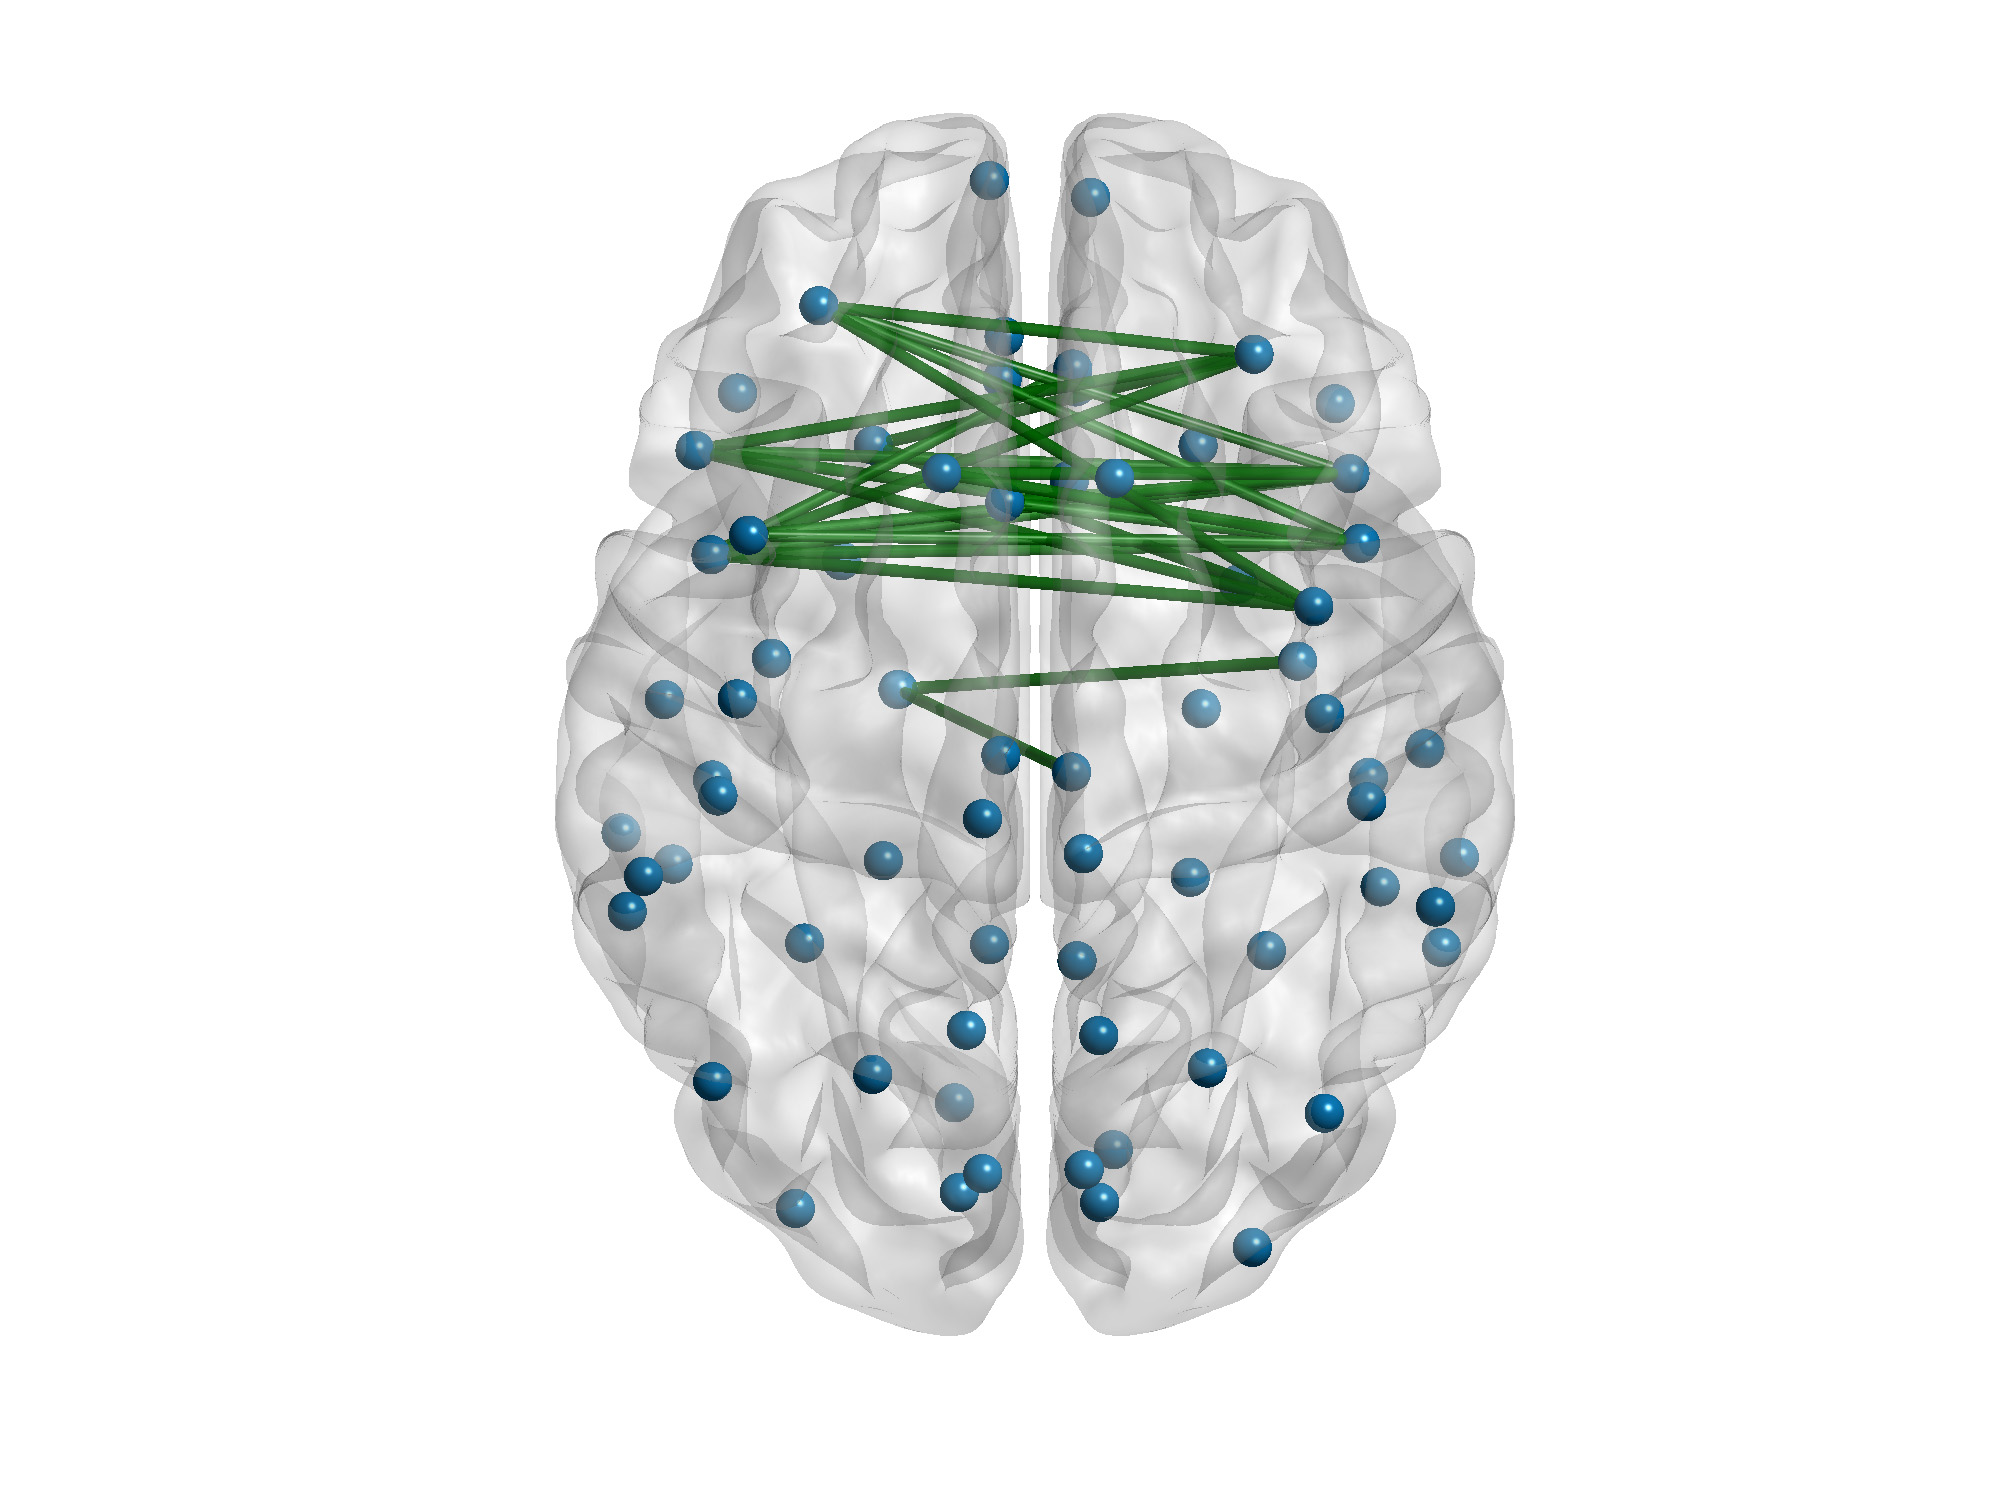 brain- white matter connections.jpg